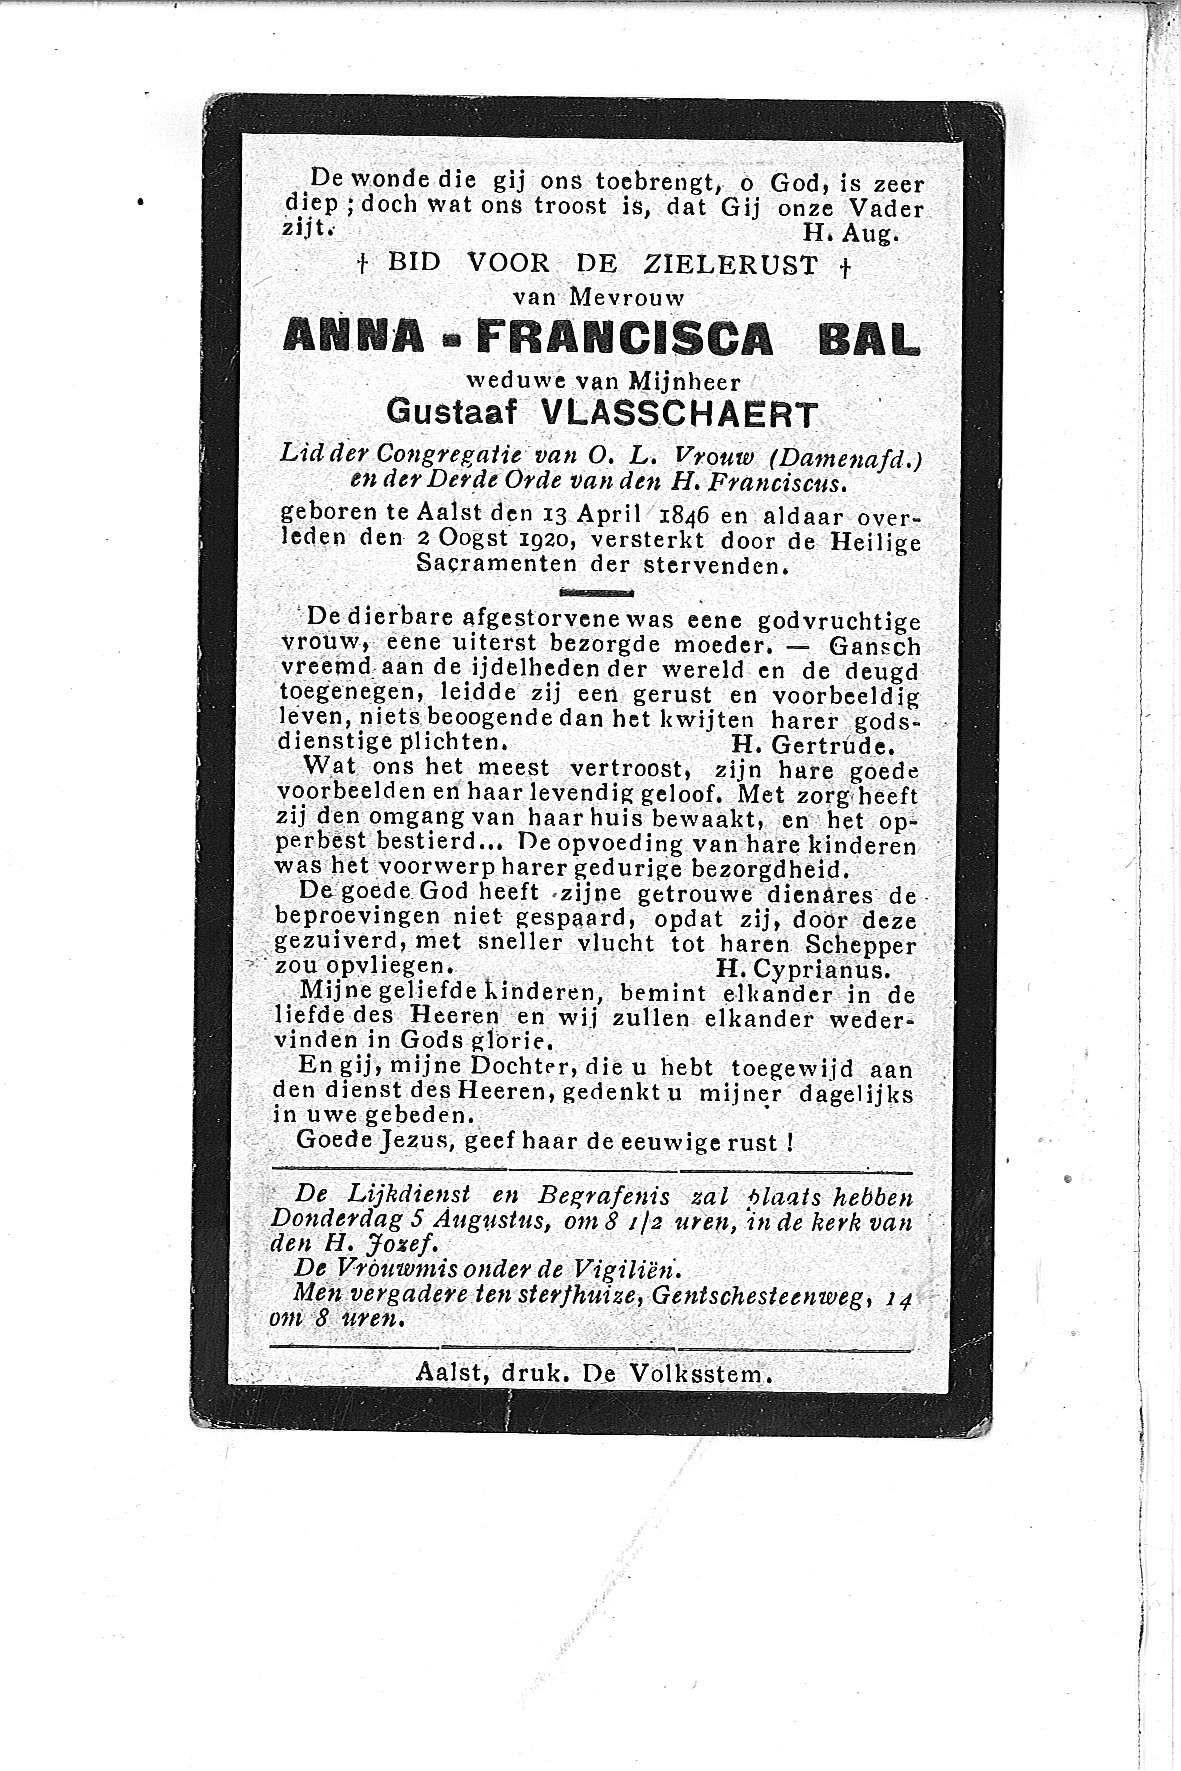 Anna-Francisca(1920)20101006133005_00019.jpg